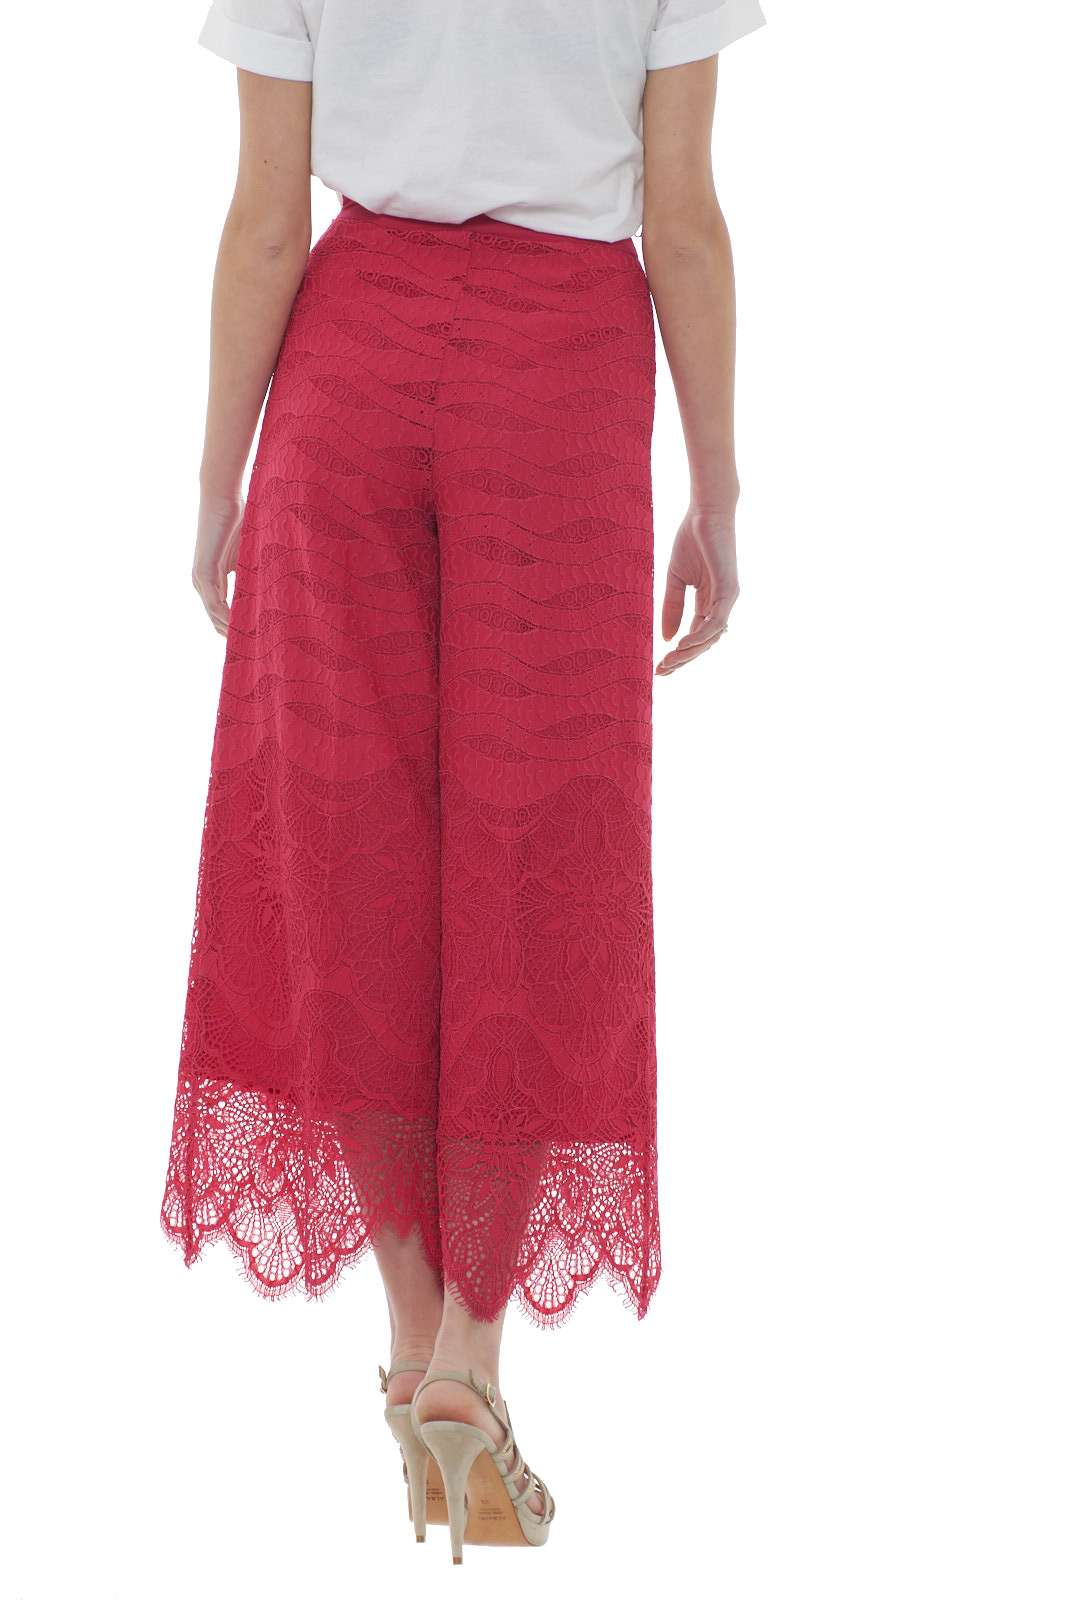 https://www.parmax.com/media/catalog/product/a/i/PE-outlet_parmax-pantaloni-donna-TwinSet-201TP2033-C.jpg